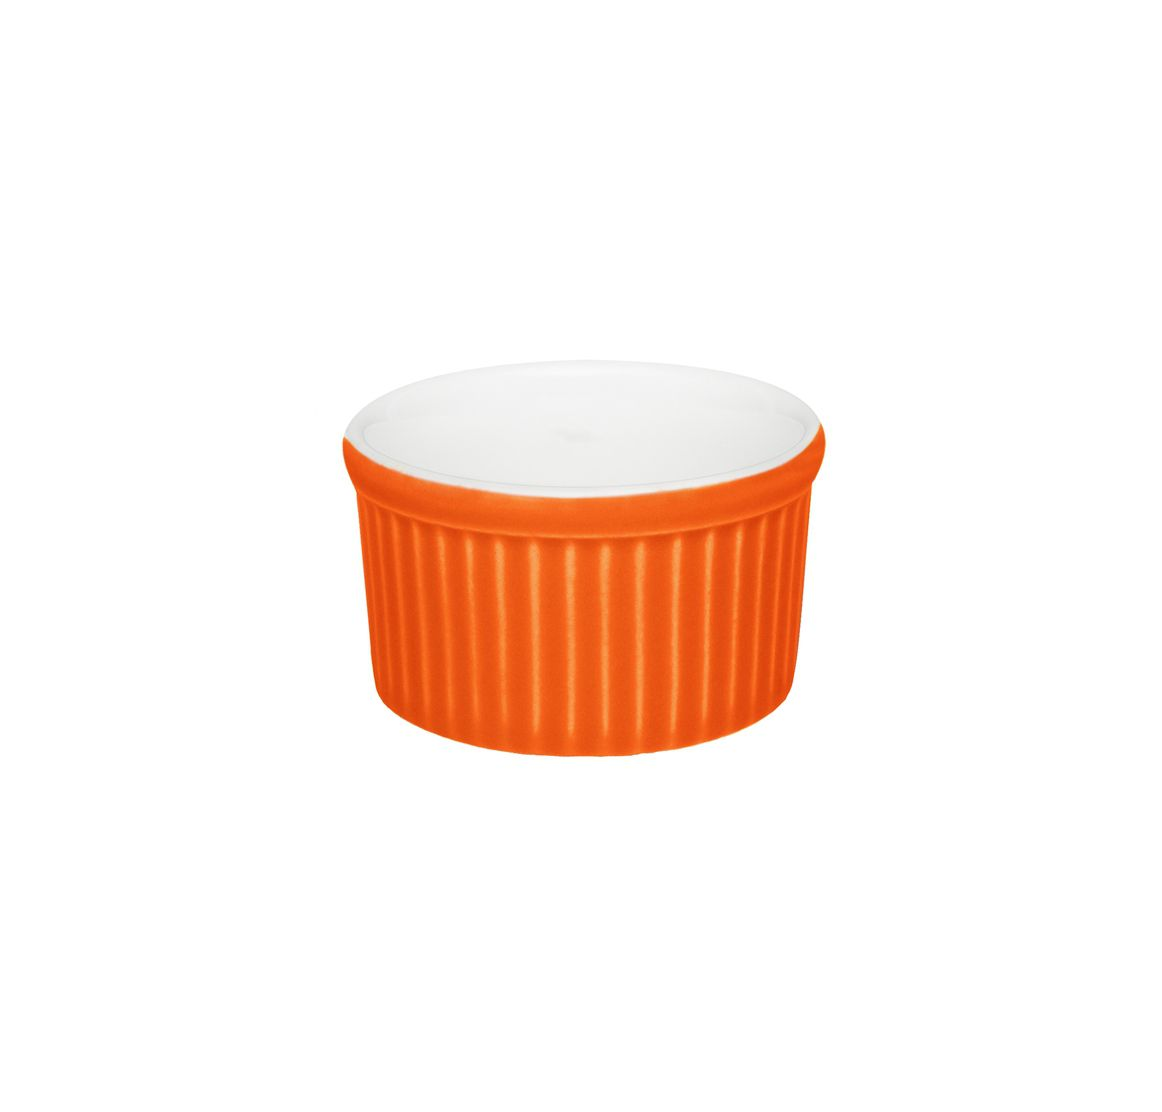 Tigela Ramequin 6X3Cm 50Ml - Branco/Laranja - Oxford Cookware